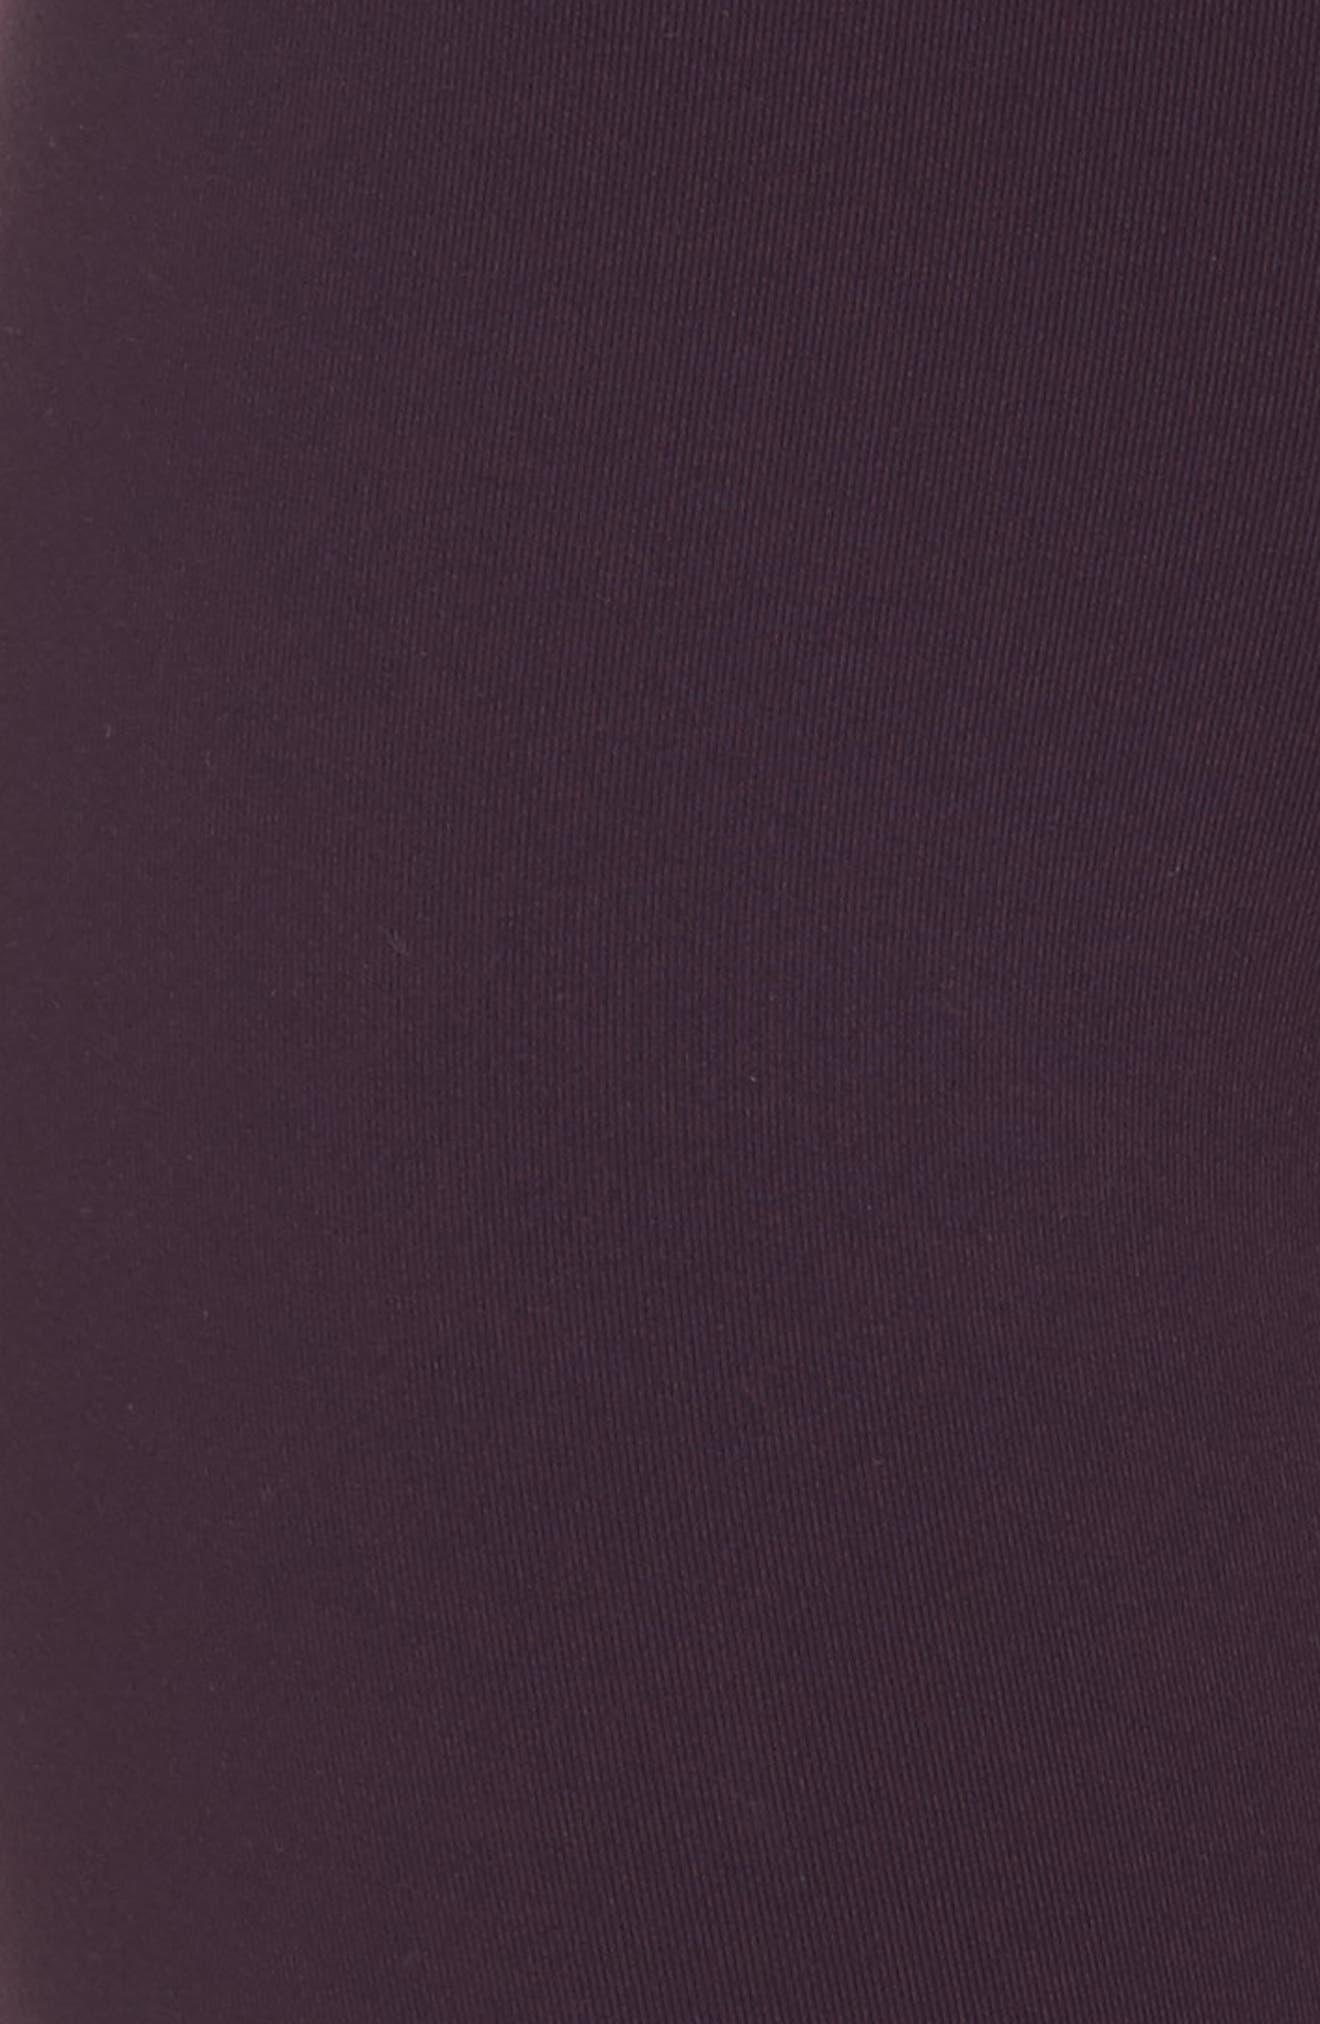 Power Legendary High Waist Tights,                             Alternate thumbnail 6, color,                             Port Wine/ Black